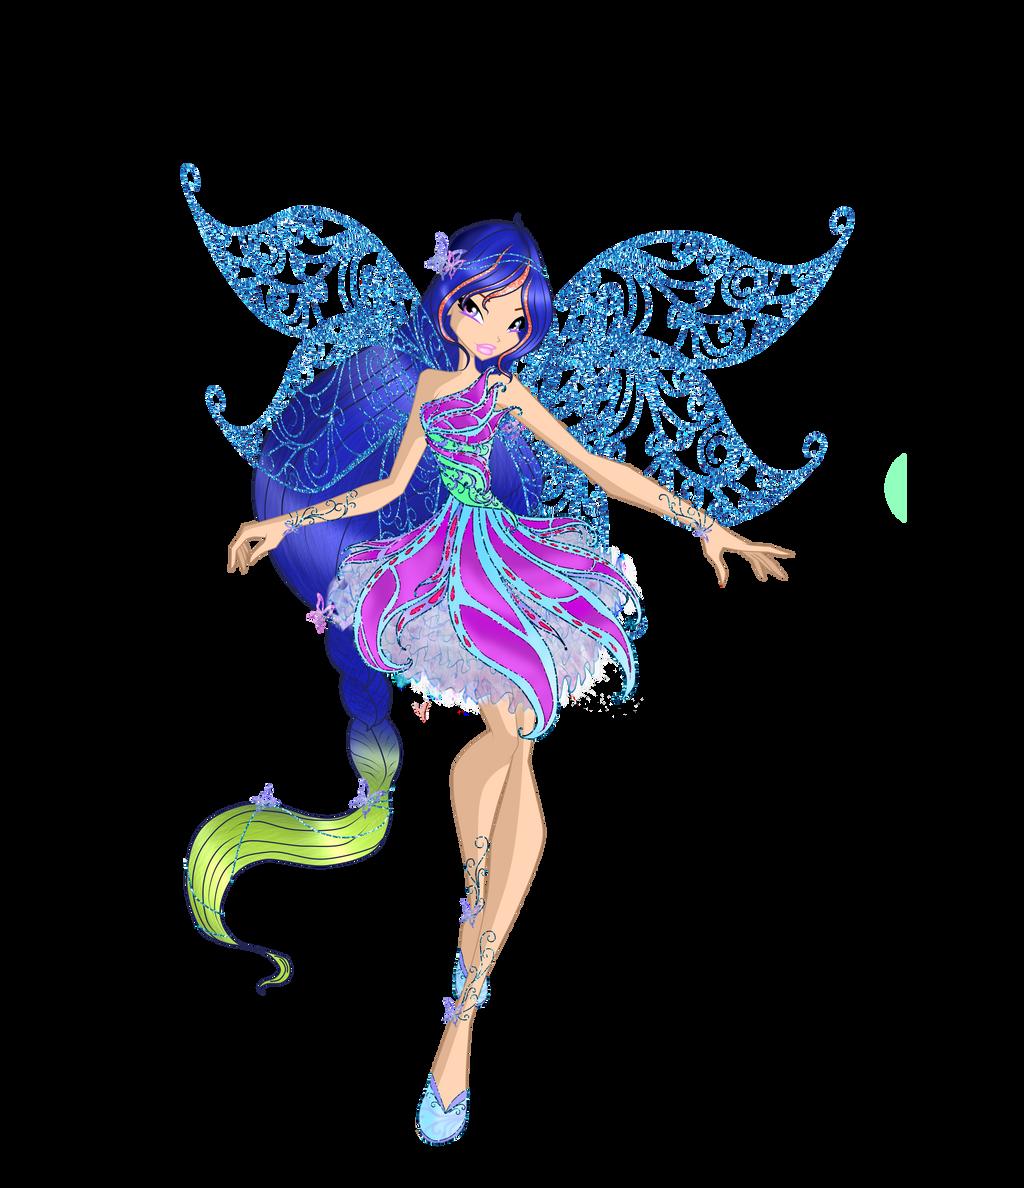 COMIX Saisha Butterflix By GlimmeringAngel26 On DeviantArt